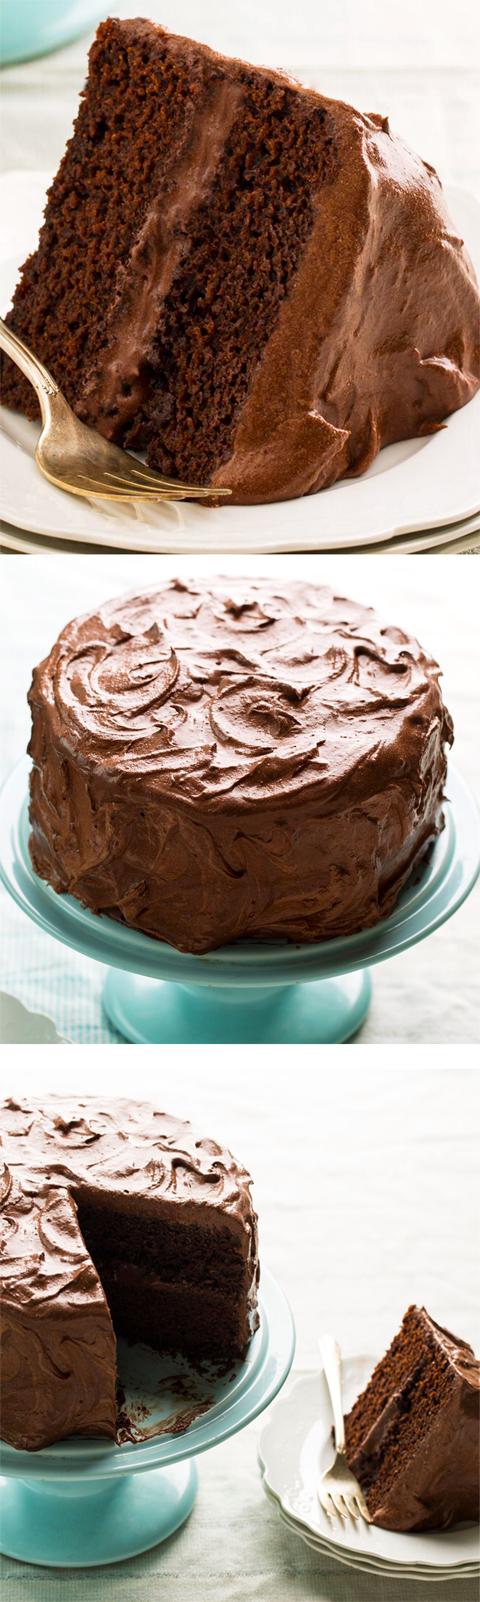 The BEST Vegan Chocolate Cake Recipe, with basic ingredients